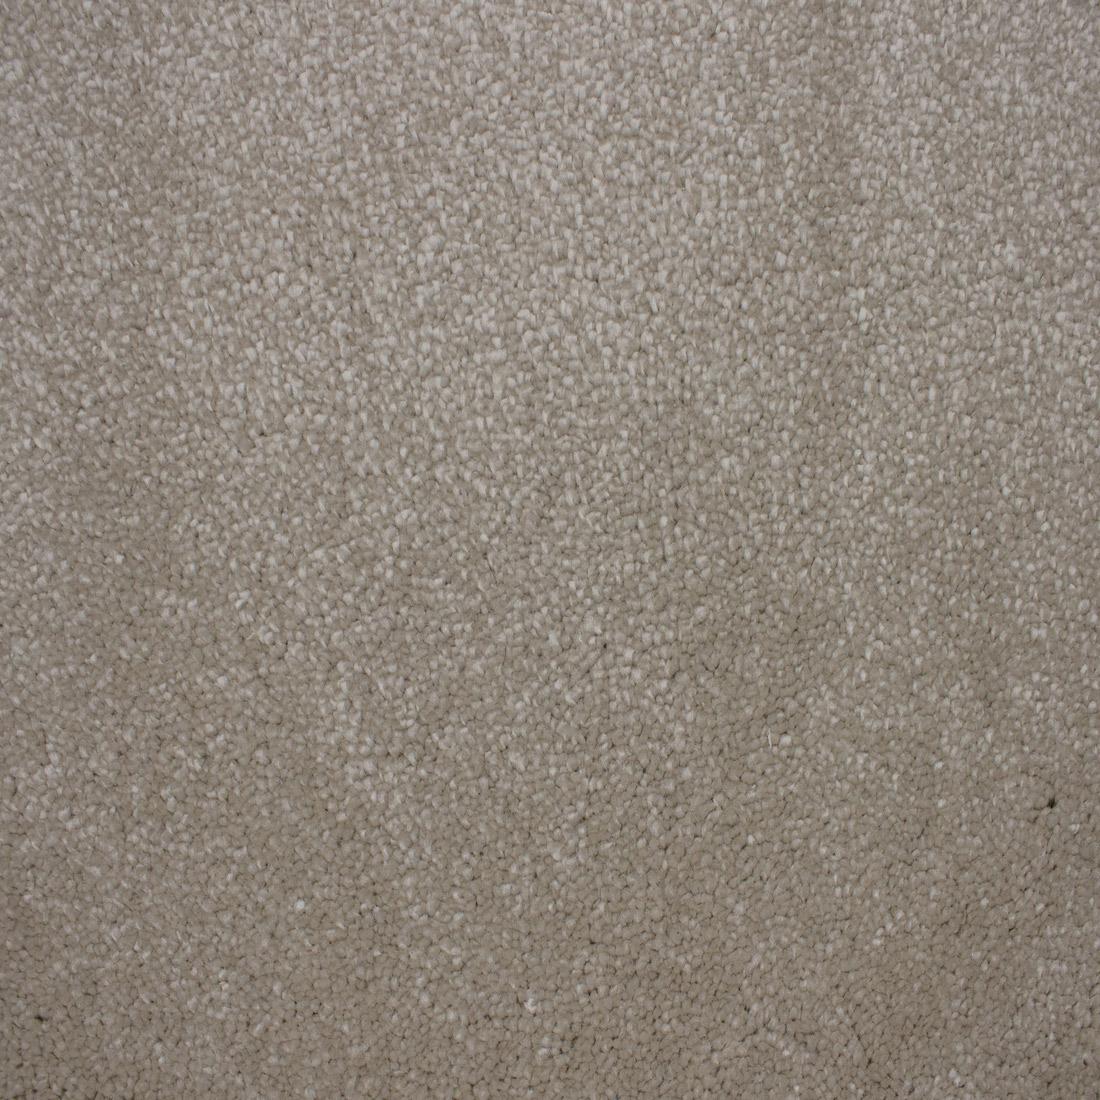 Vloerkleed Xilento Soft Melangé | 200 x 300 cm